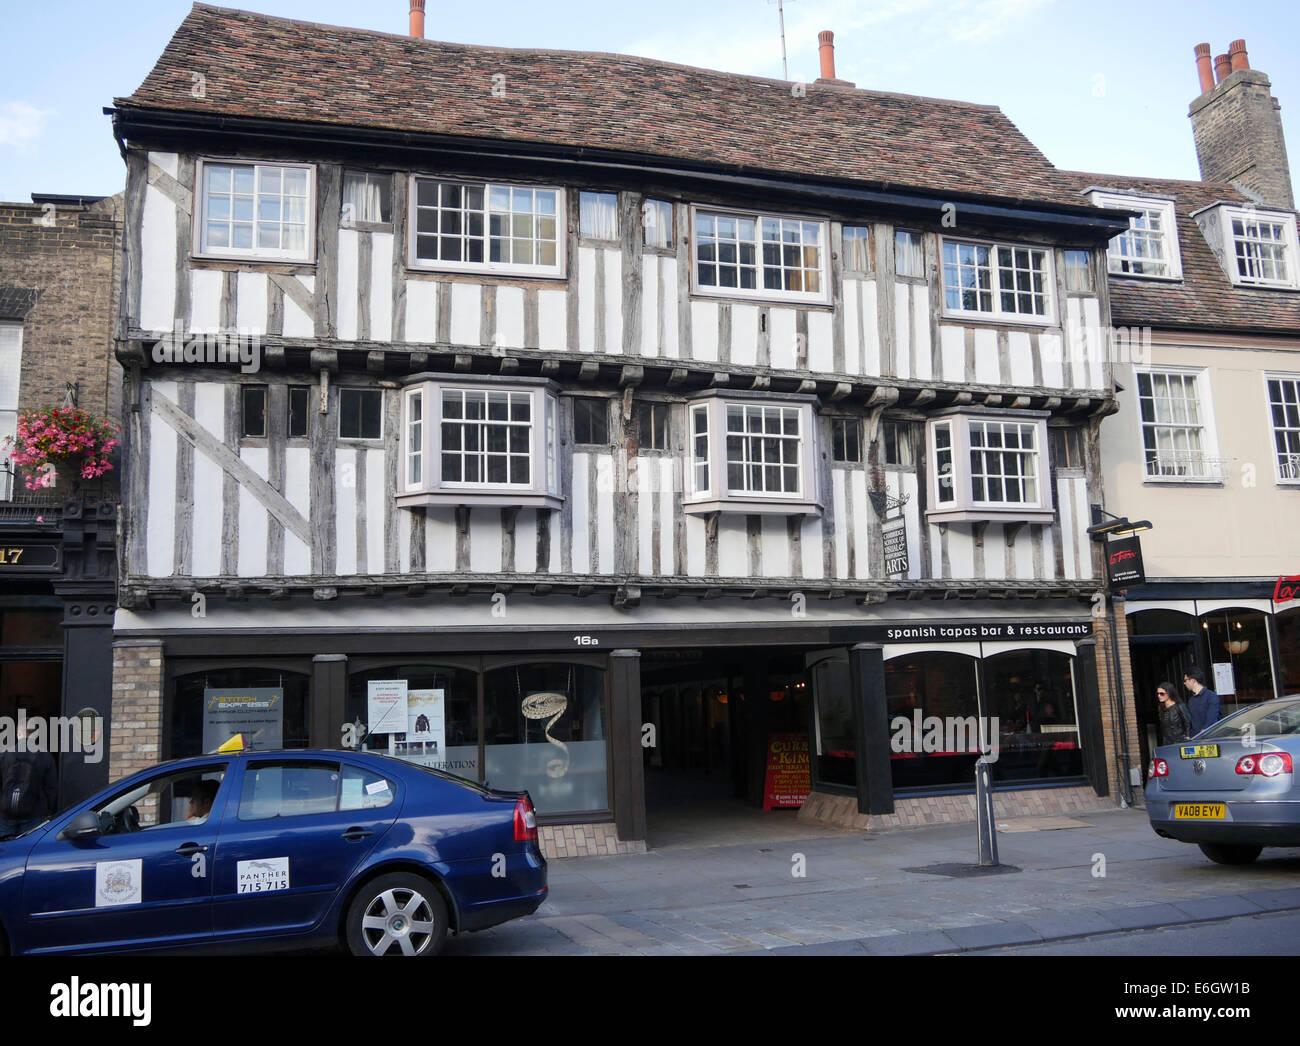 La Tasca Tapas restaurant in 16th century timber framed house, Bridge Street Cambridge - Stock Image